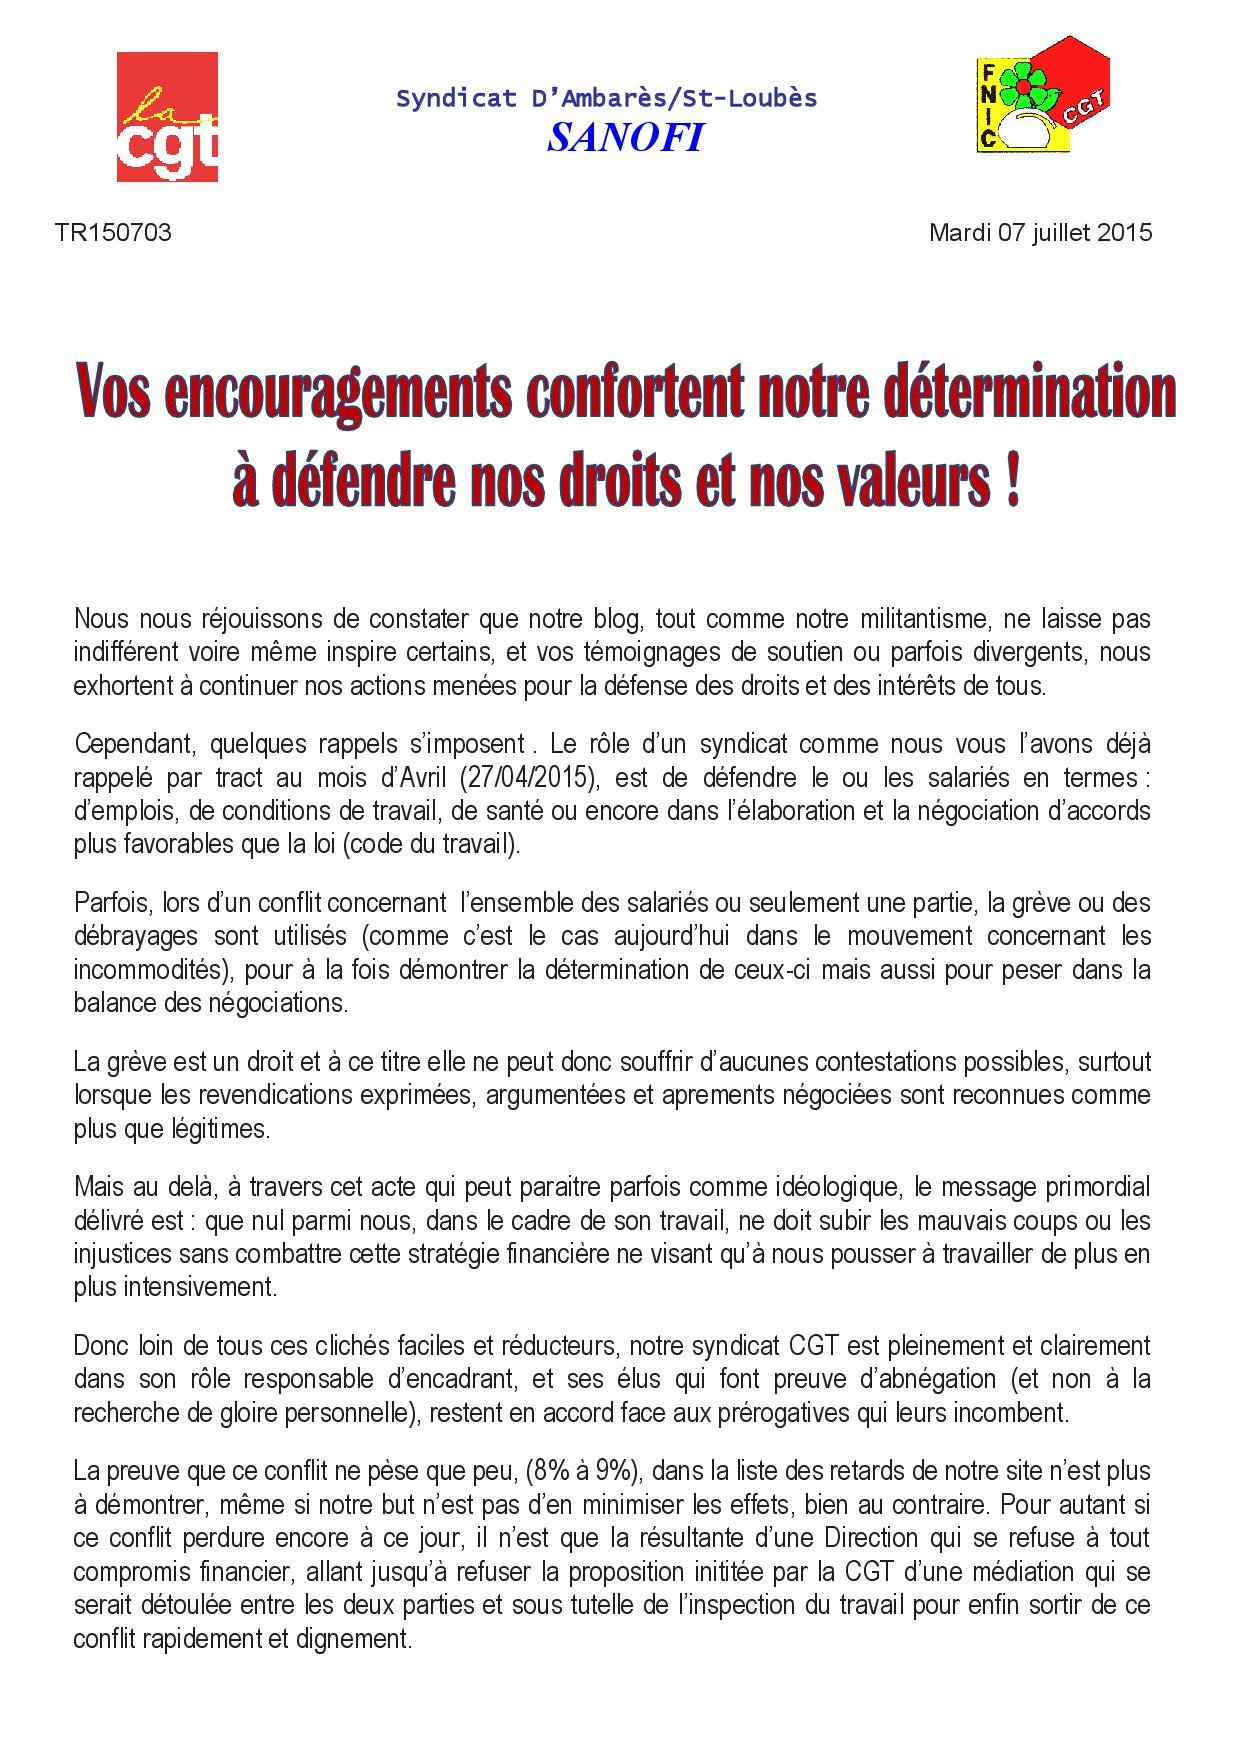 TR150703 grève du mardi 07 juillet 2015